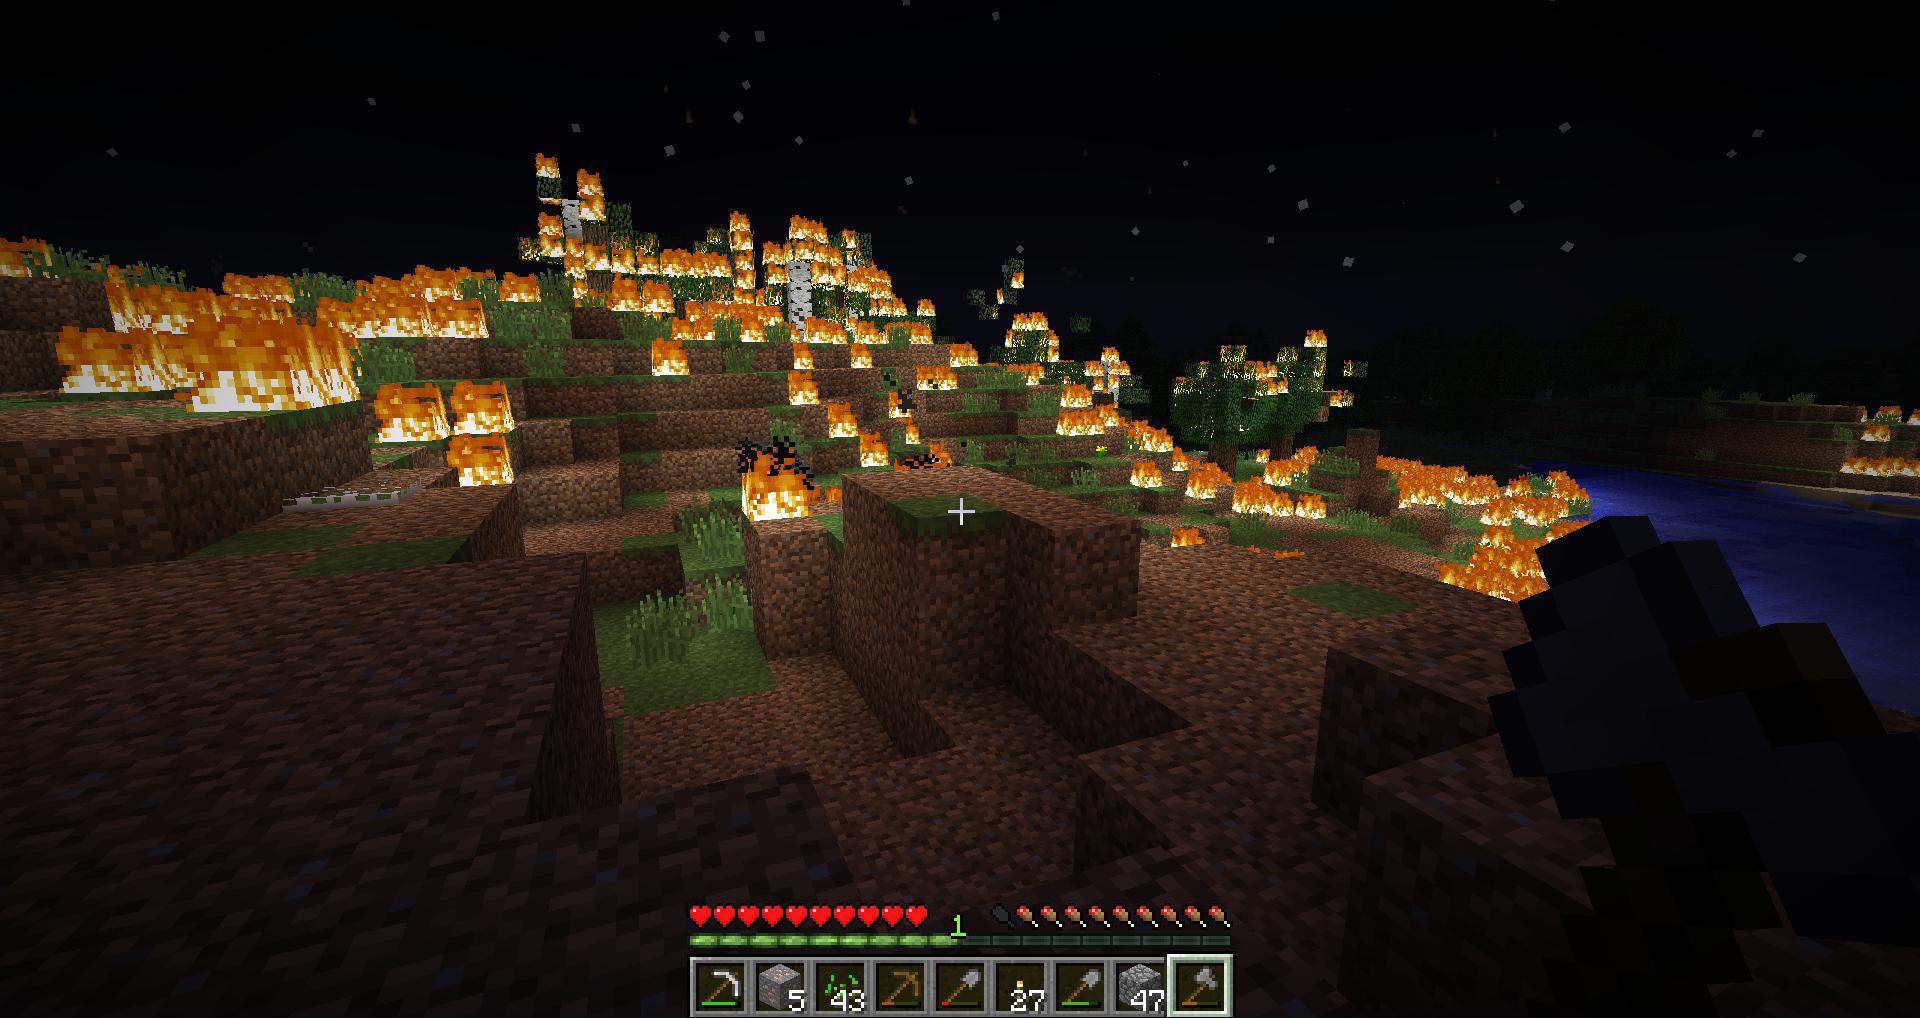 http://minecraft-forum.net/wp-content/uploads/2013/07/49ec1__Solar-Apocalypse-Mod-2.jpg